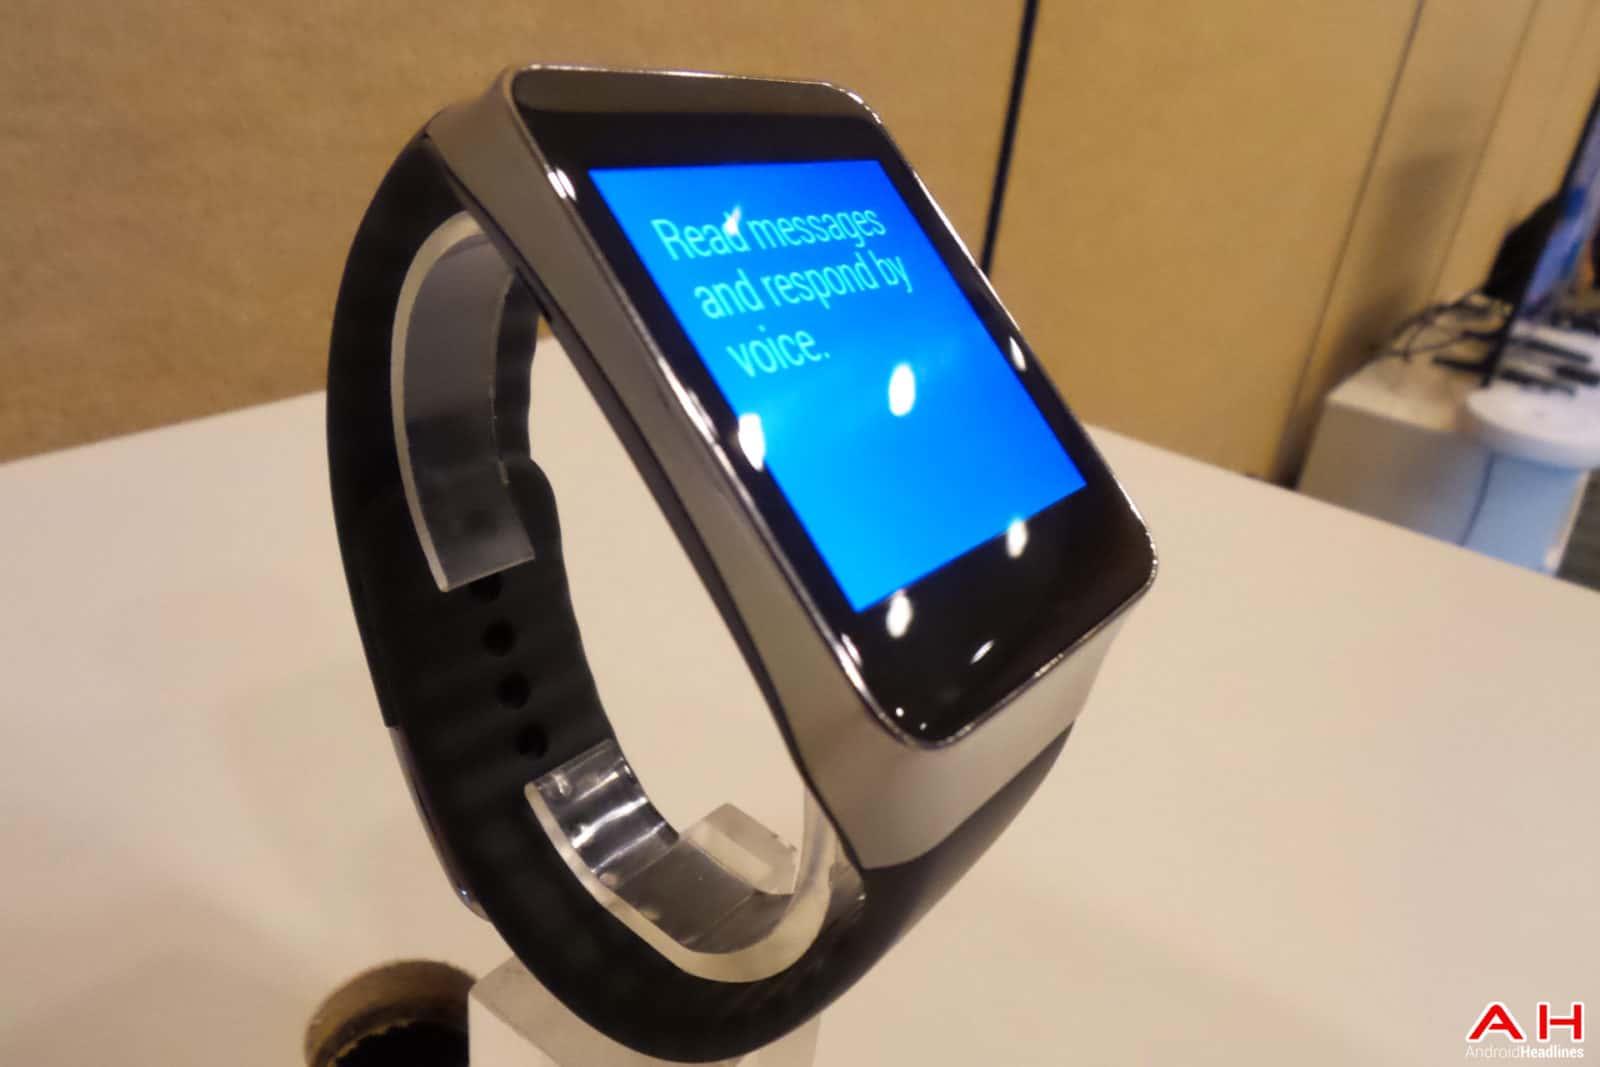 AH Google IO 2014 Galaxy Gear Live  (3 of 7)